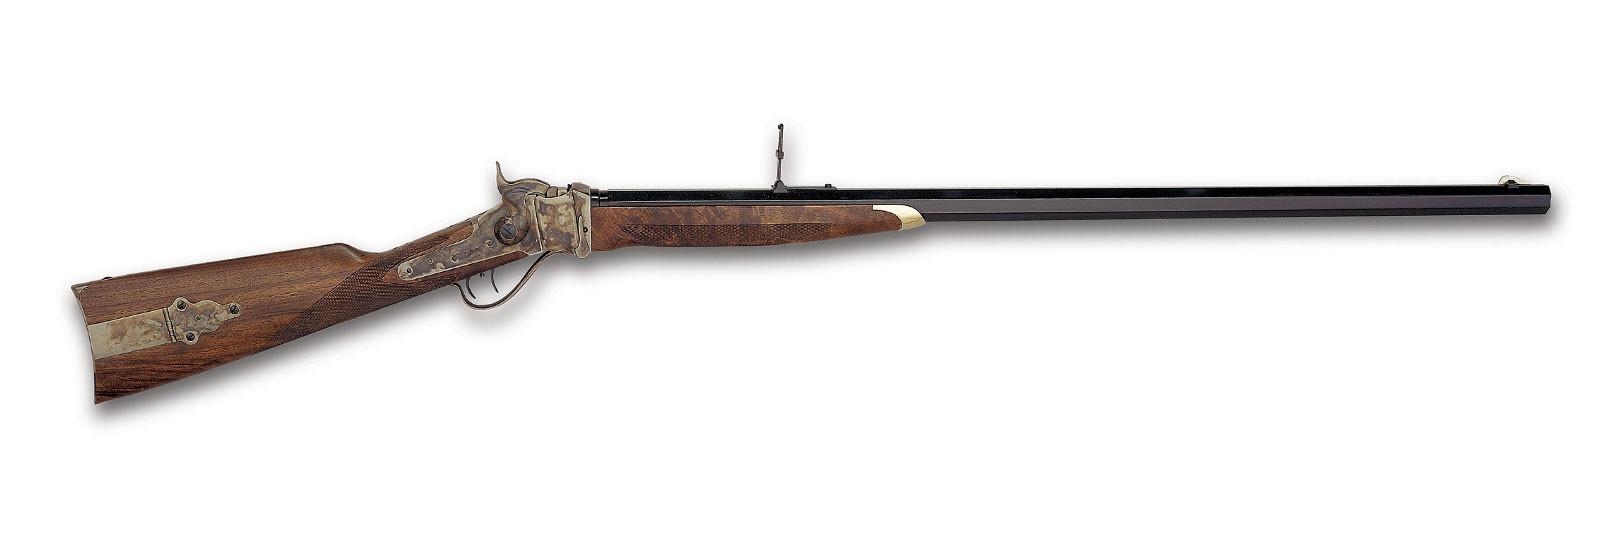 1874 Sharps rifle